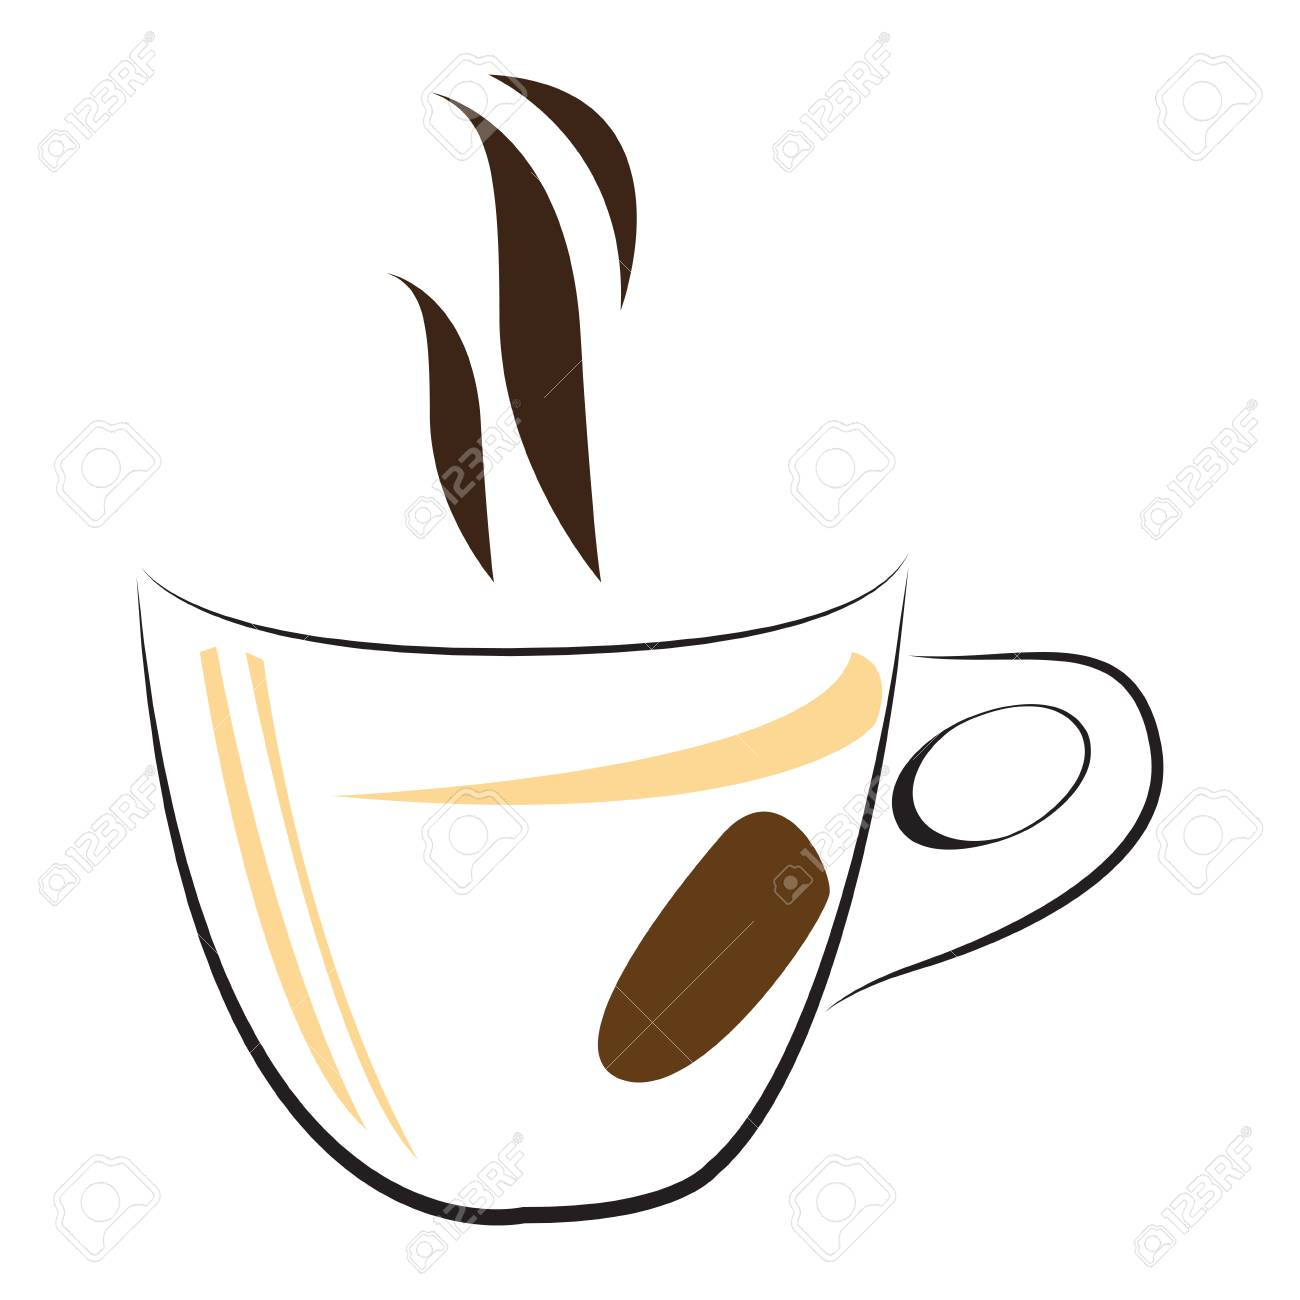 Isolated abstract coffee mug logo, Vector illustration.